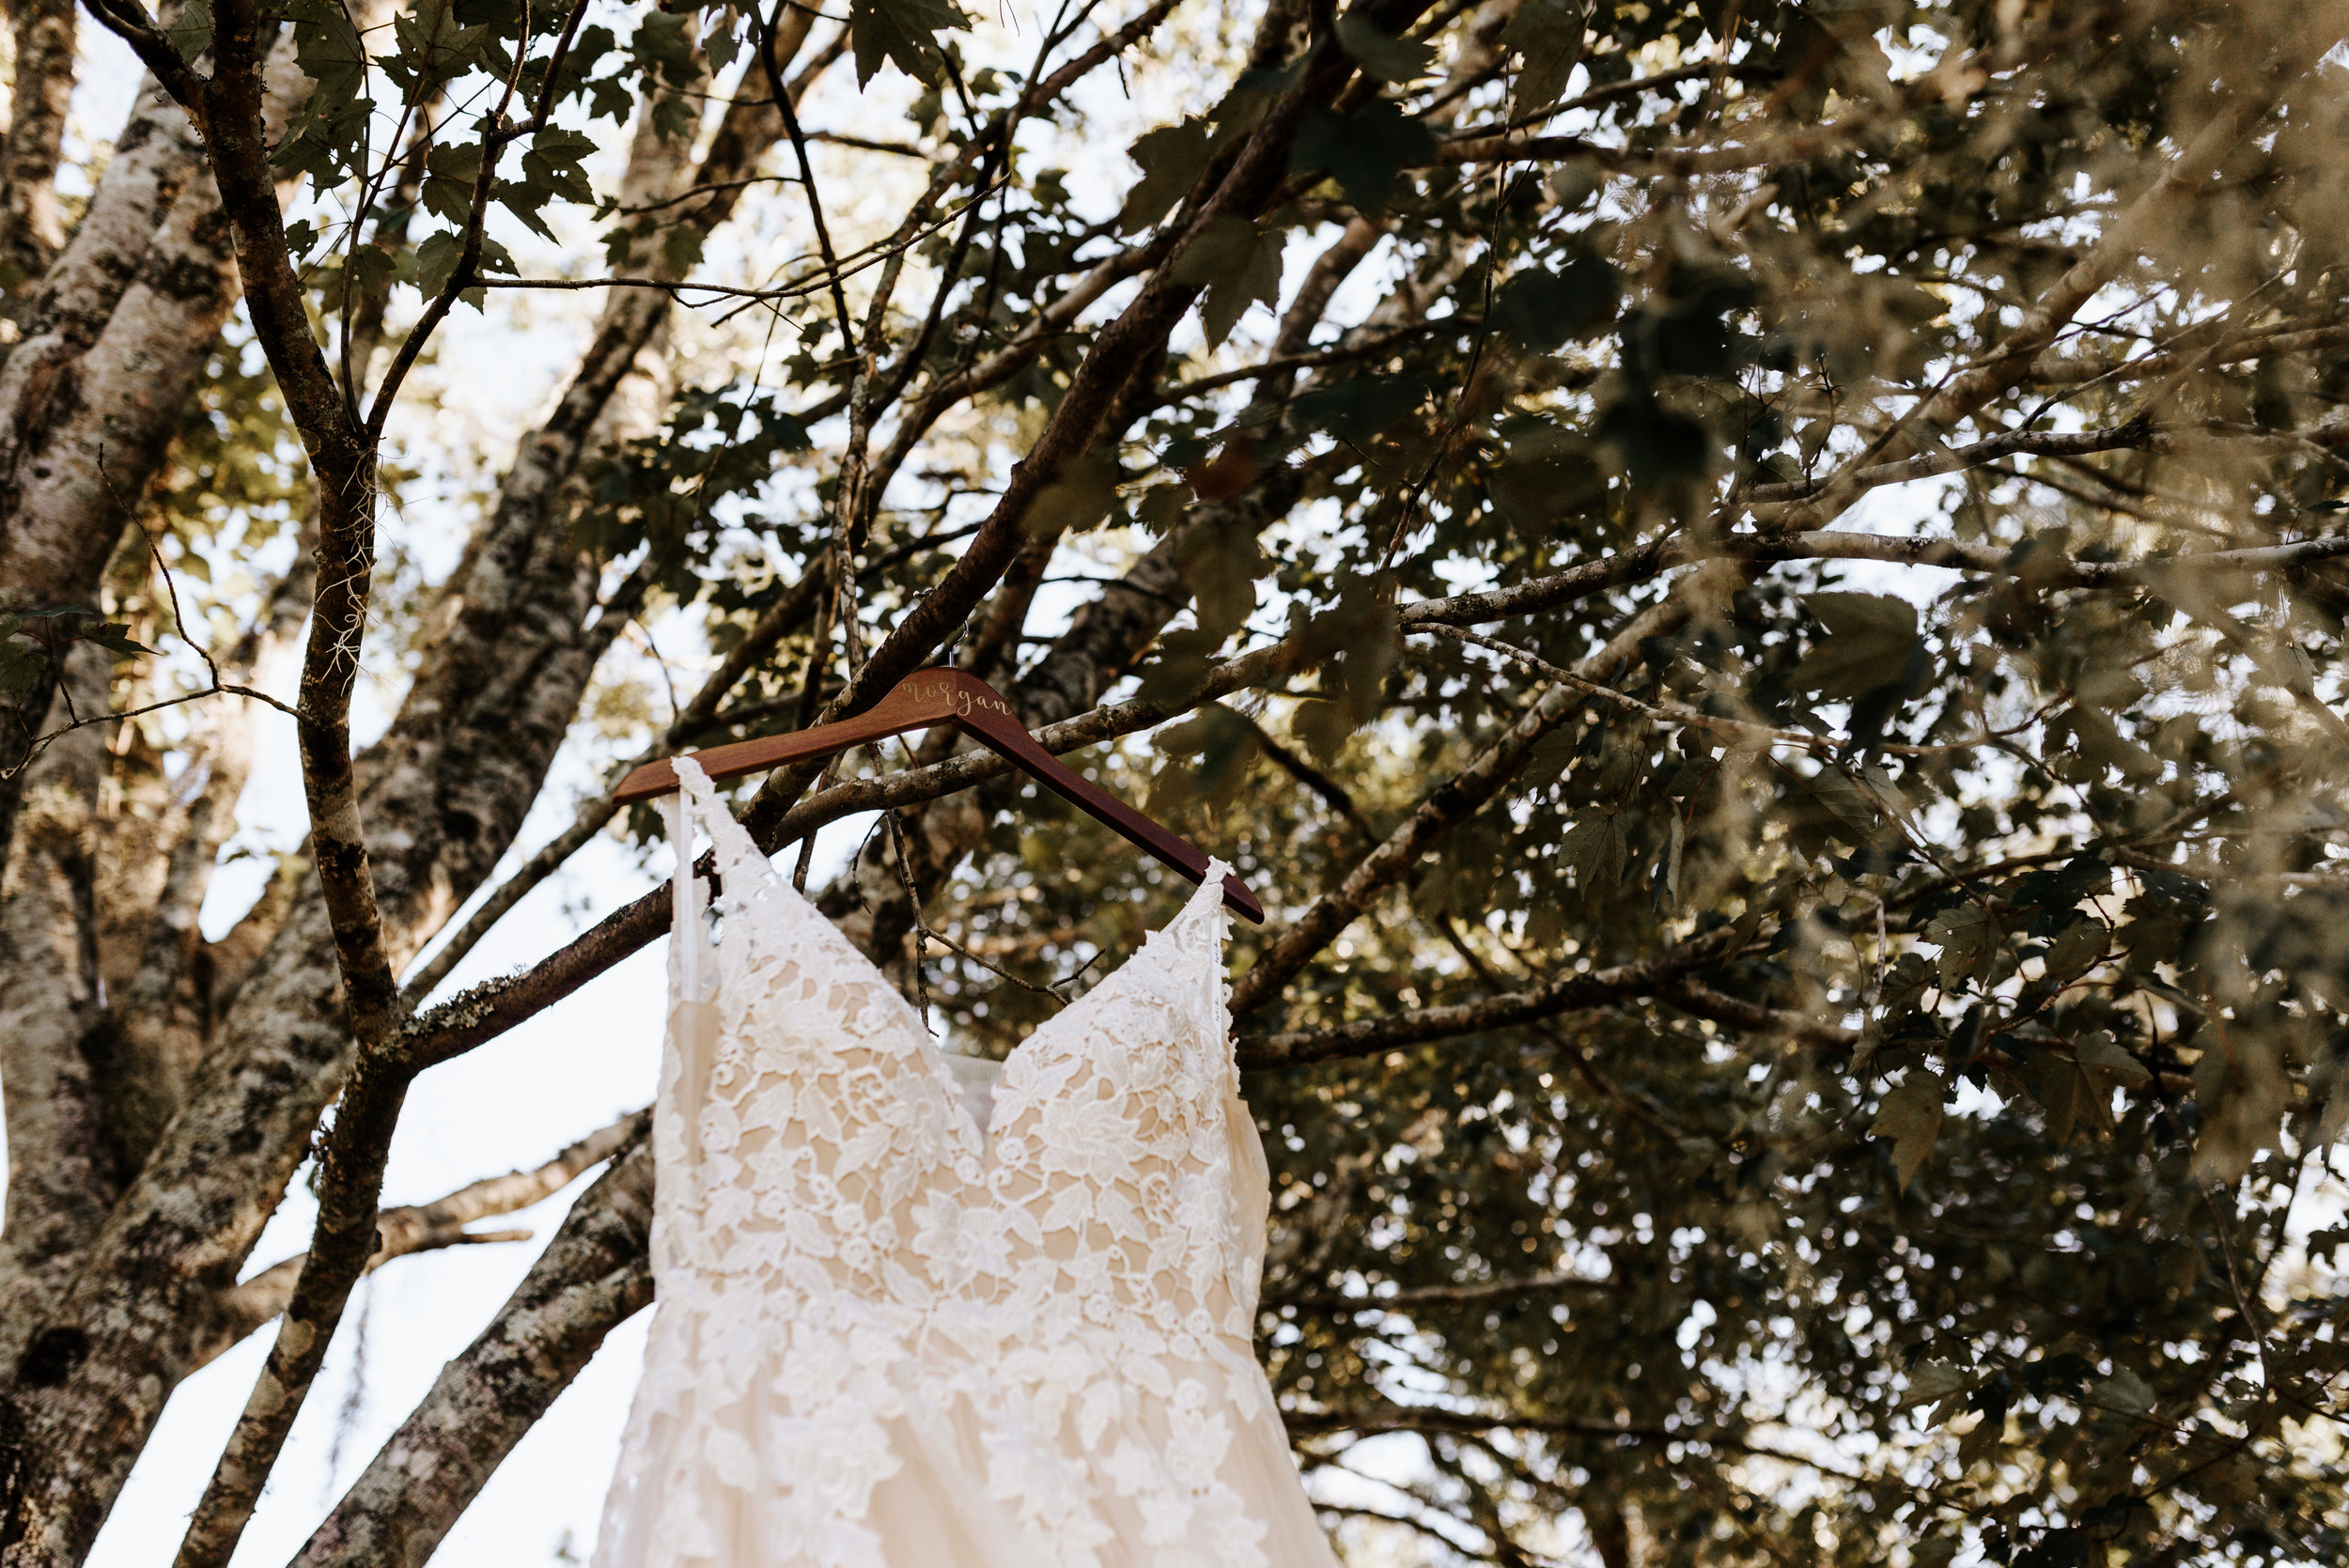 Morgan-Brandon-Wedding-All-4-One-Farms-Jacksonville-Florida-Photographer-Photography-by-V-6029.jpg